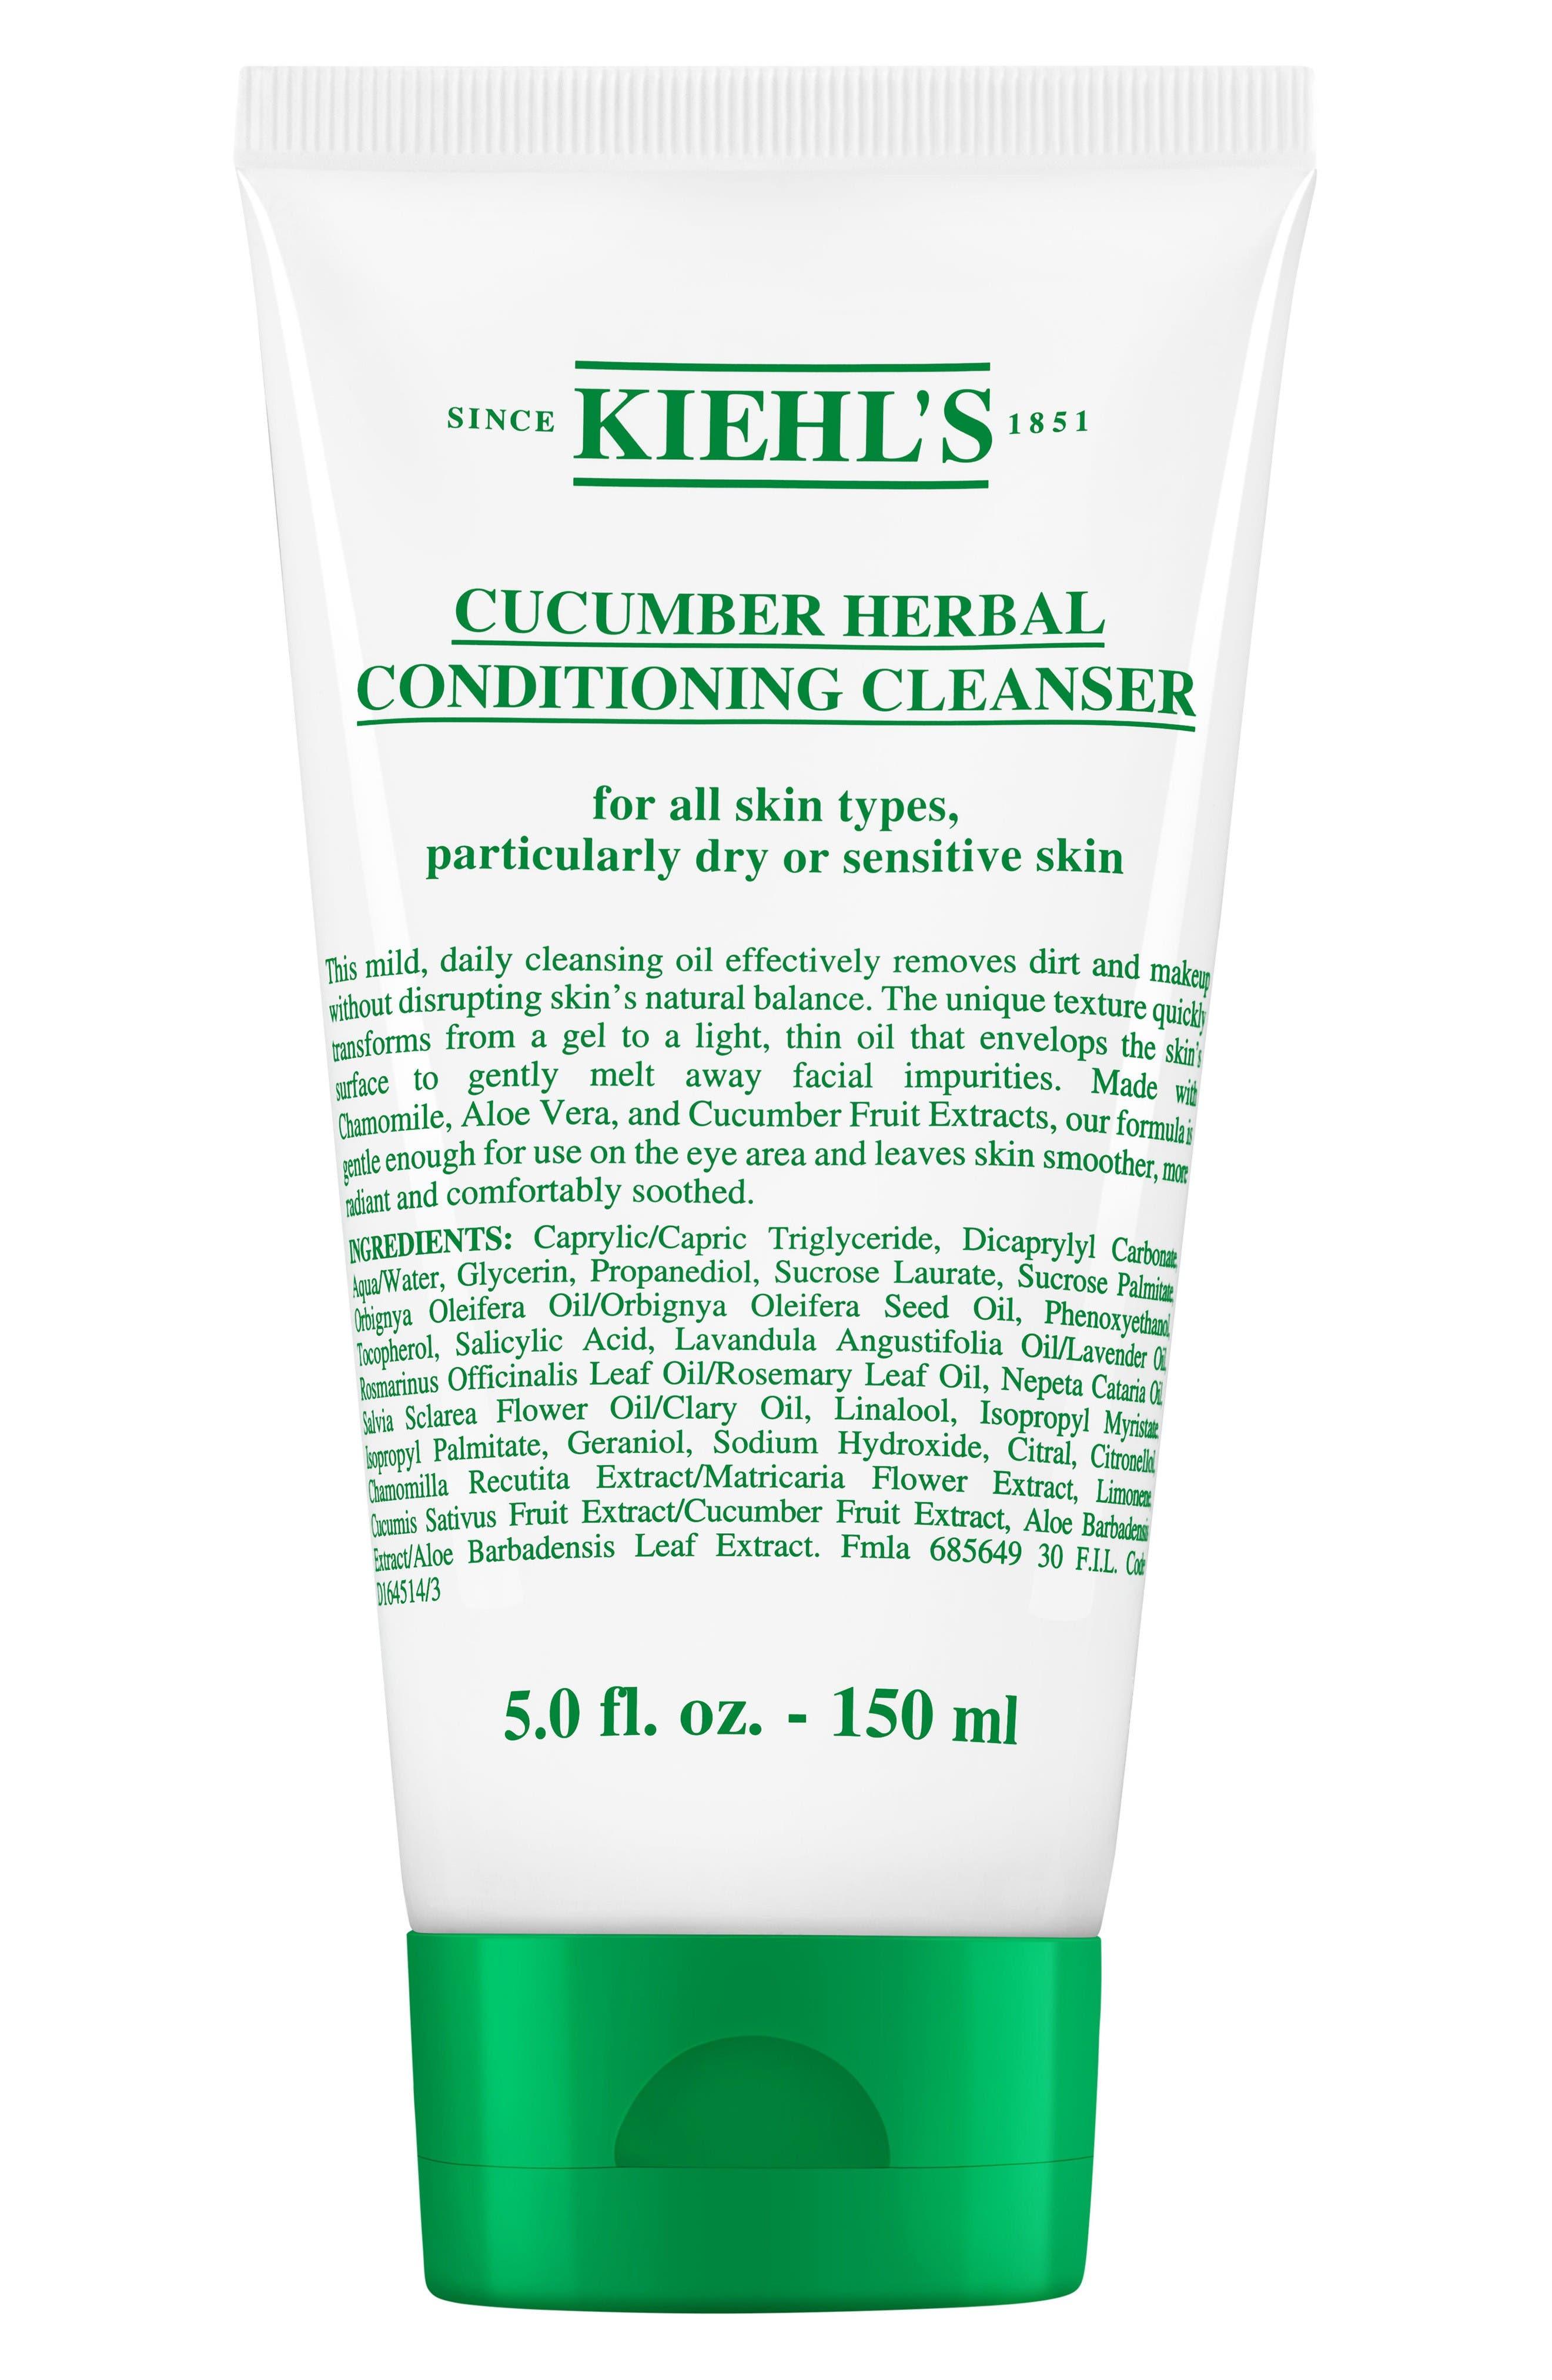 Kiehl's Since 1851 Cucumber Herbal Cleanser